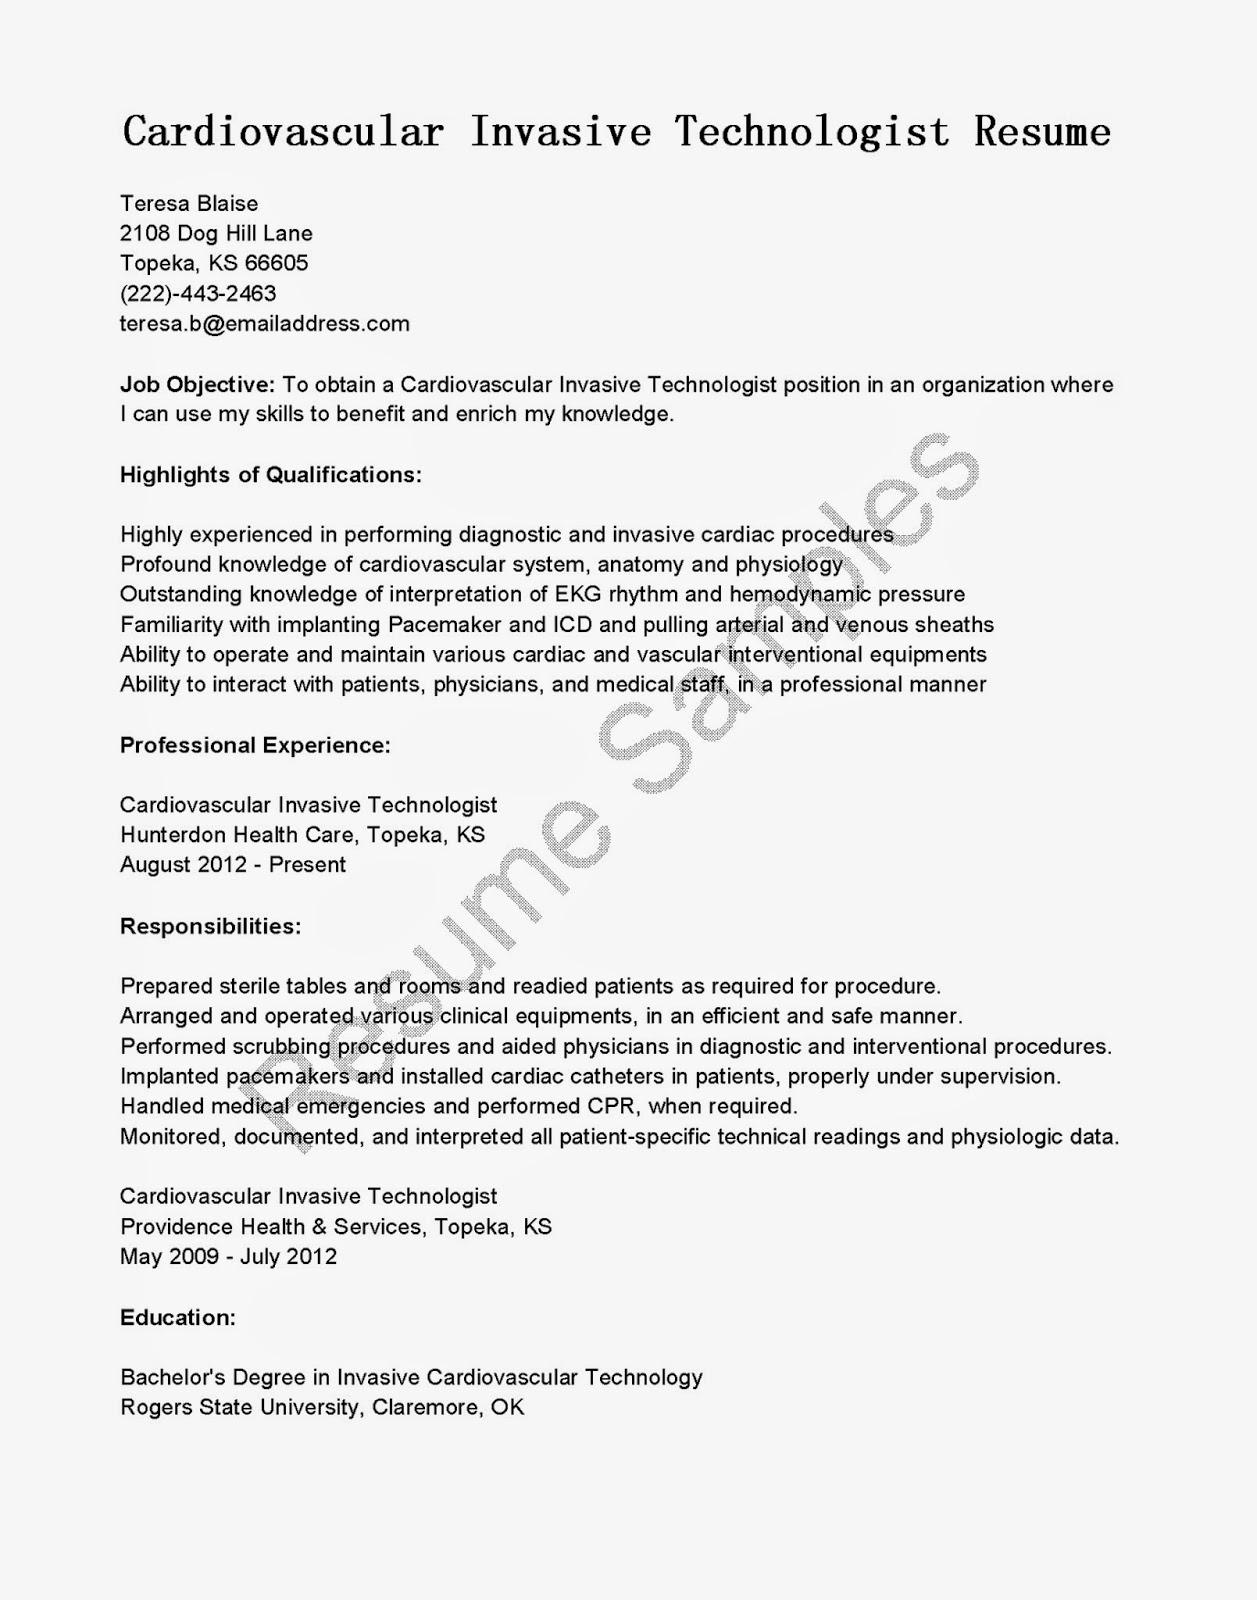 Resume Samples Cardiovascular Invasive Technologist